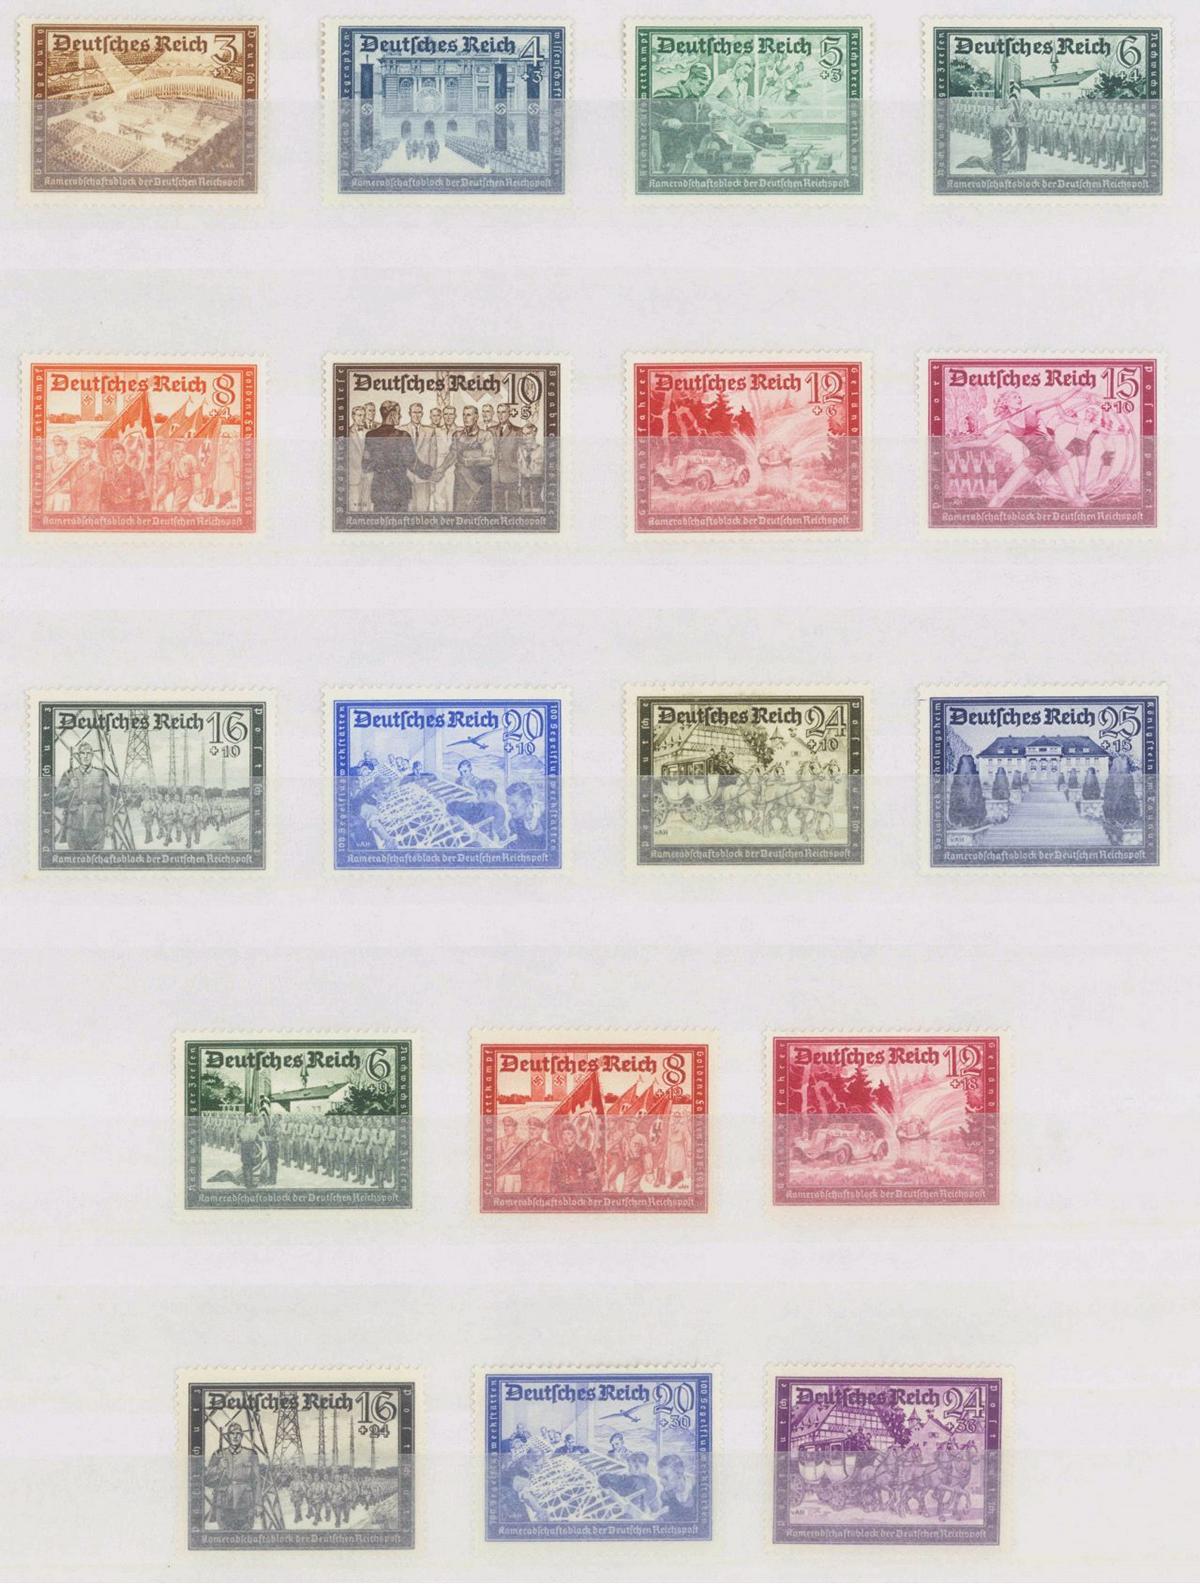 III. REICH 1939/41, Kameradschaftsblock Reichspost (I+II)